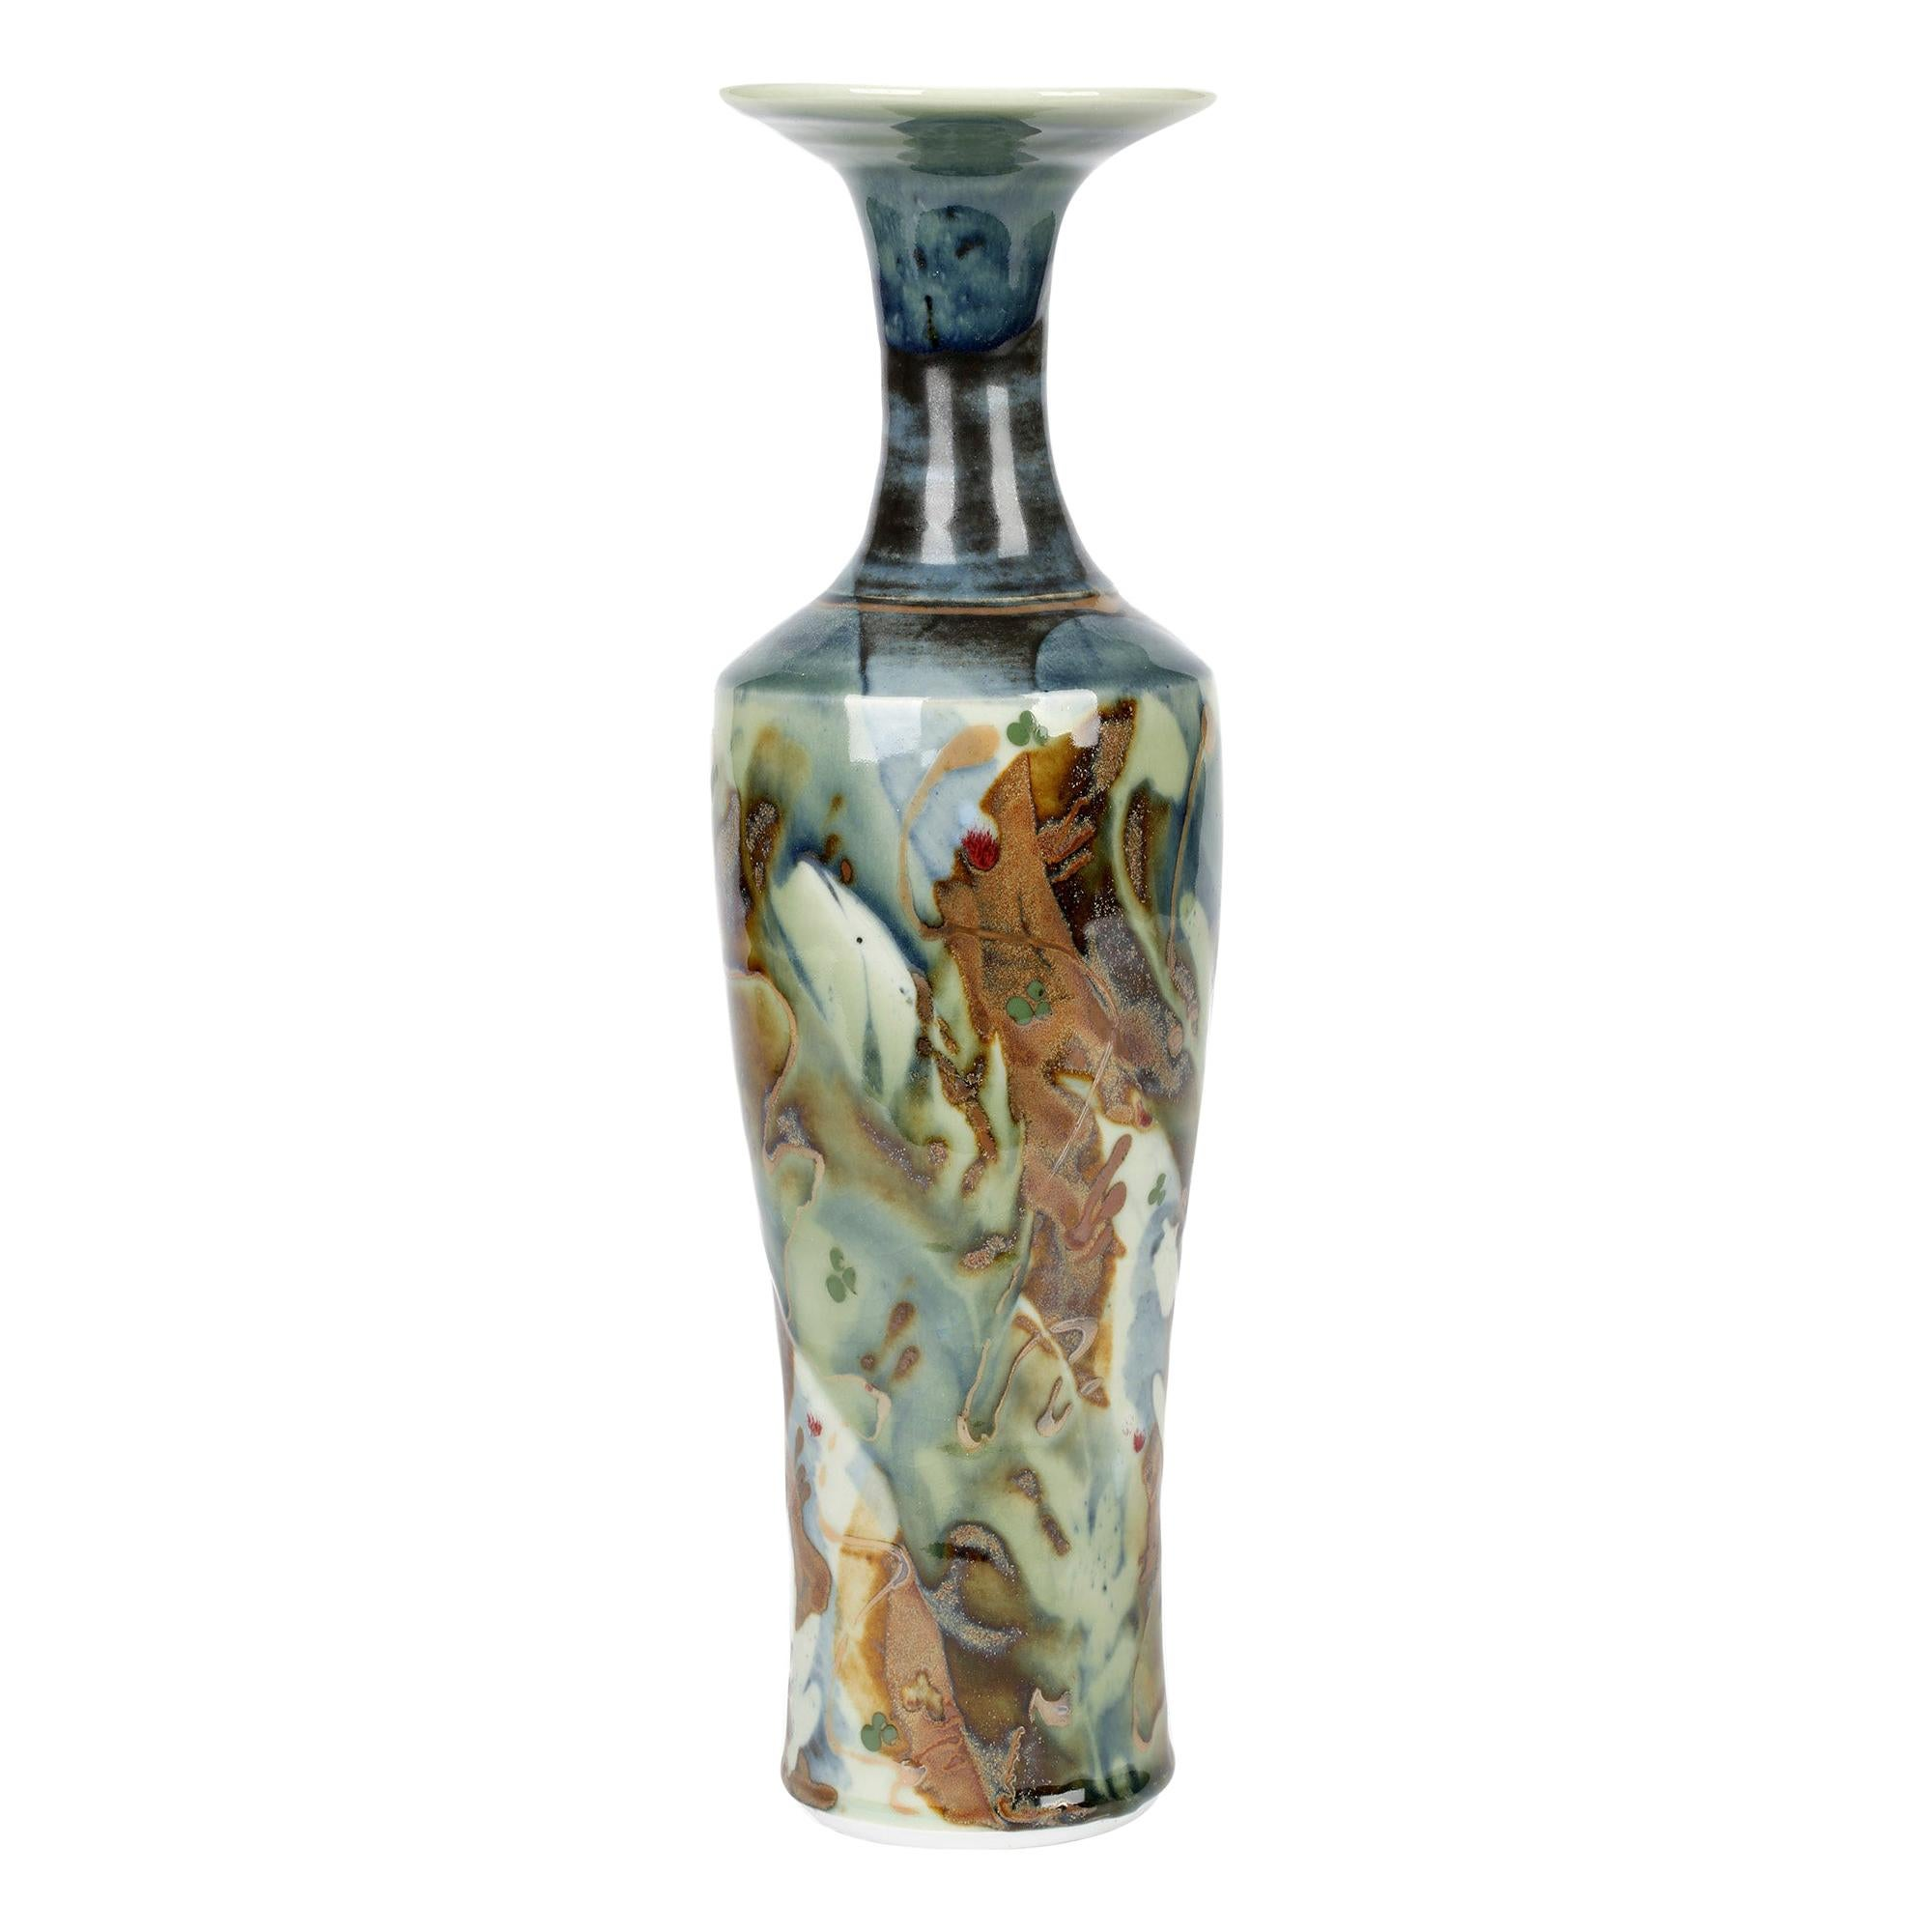 Derek Clarkson Attributed Large Abstract Glazed Porcelain Studio Pottery Vase